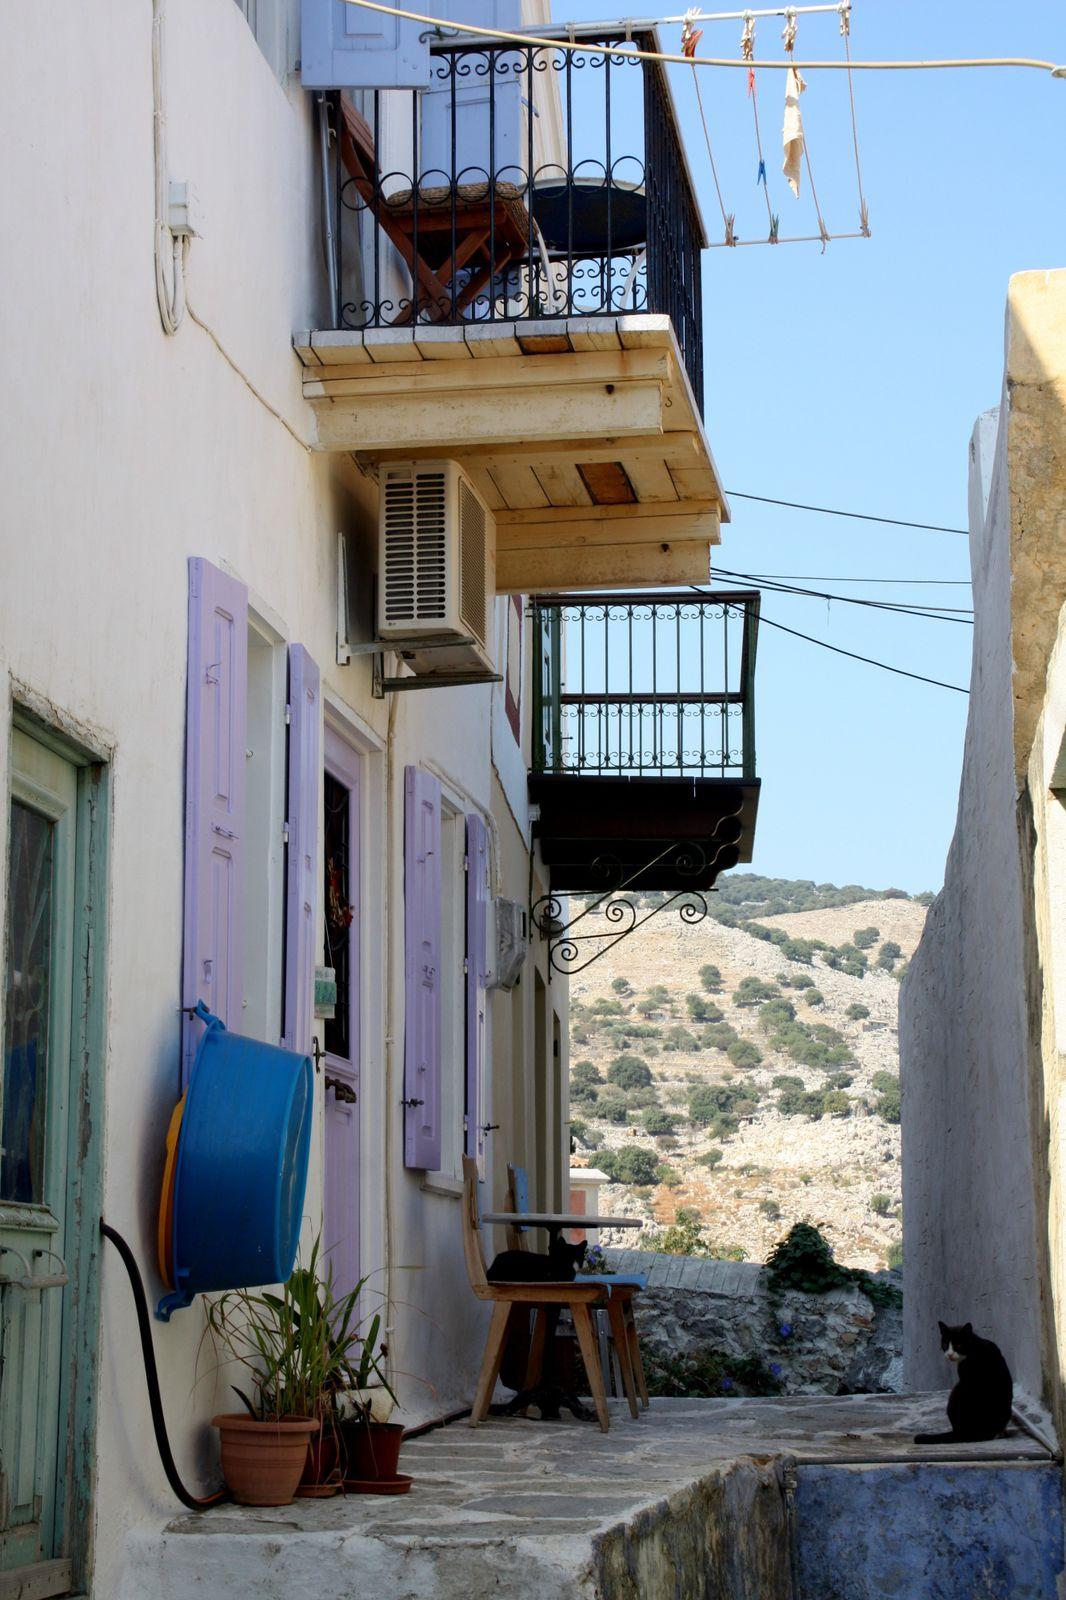 ALBUM - GRECE 2011 : SYMI et RHODES